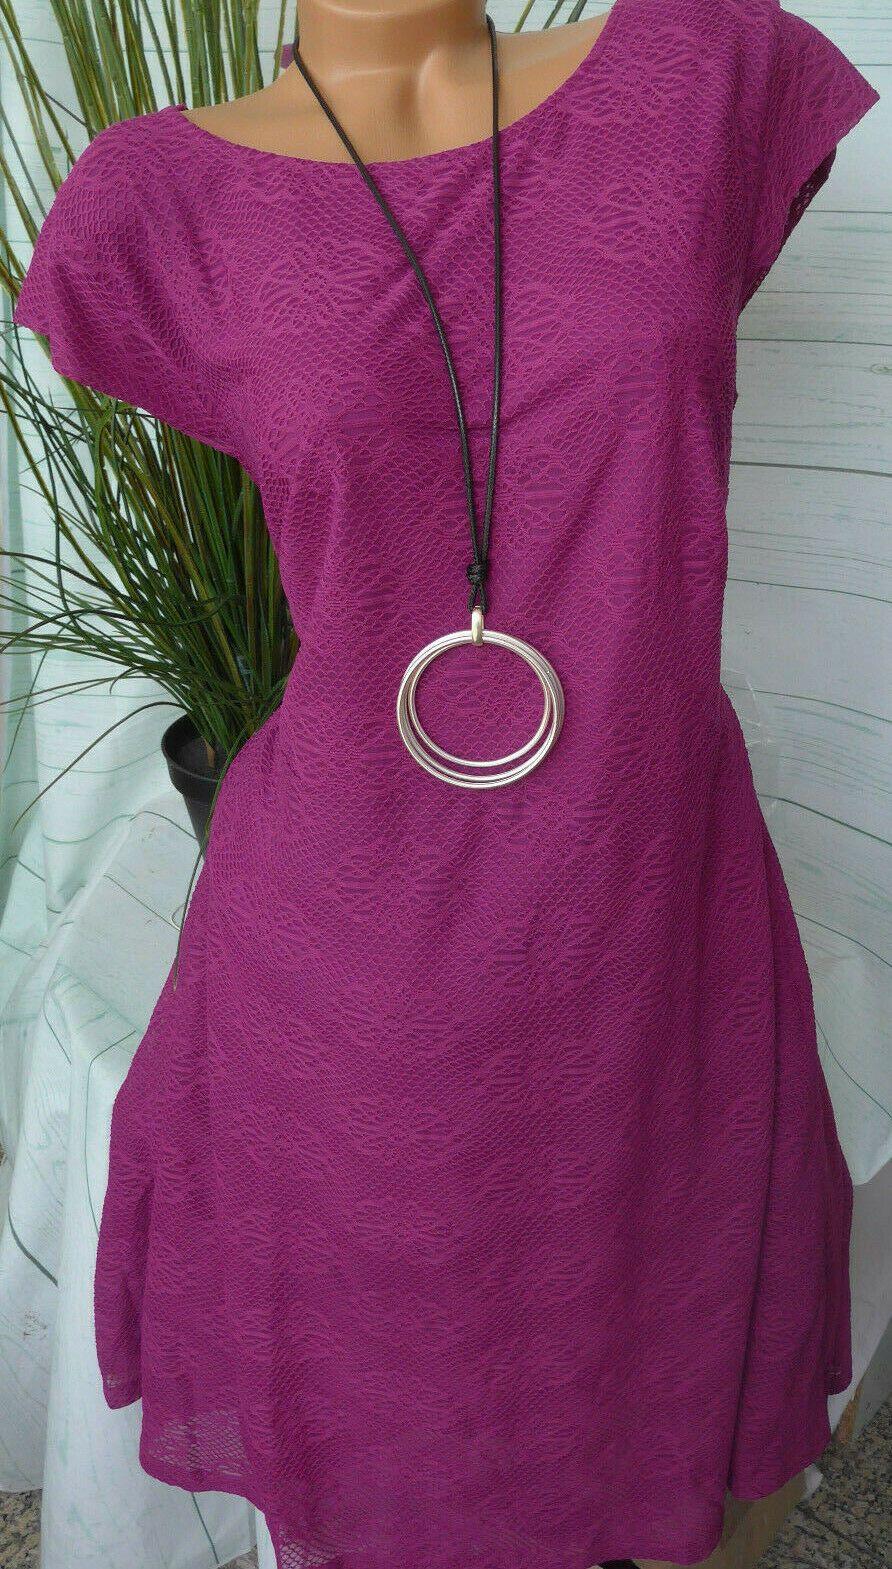 40 bis 58 Bordeaux Pailletten Sheego Eventkleid Abendkleid Kleid Gr 598